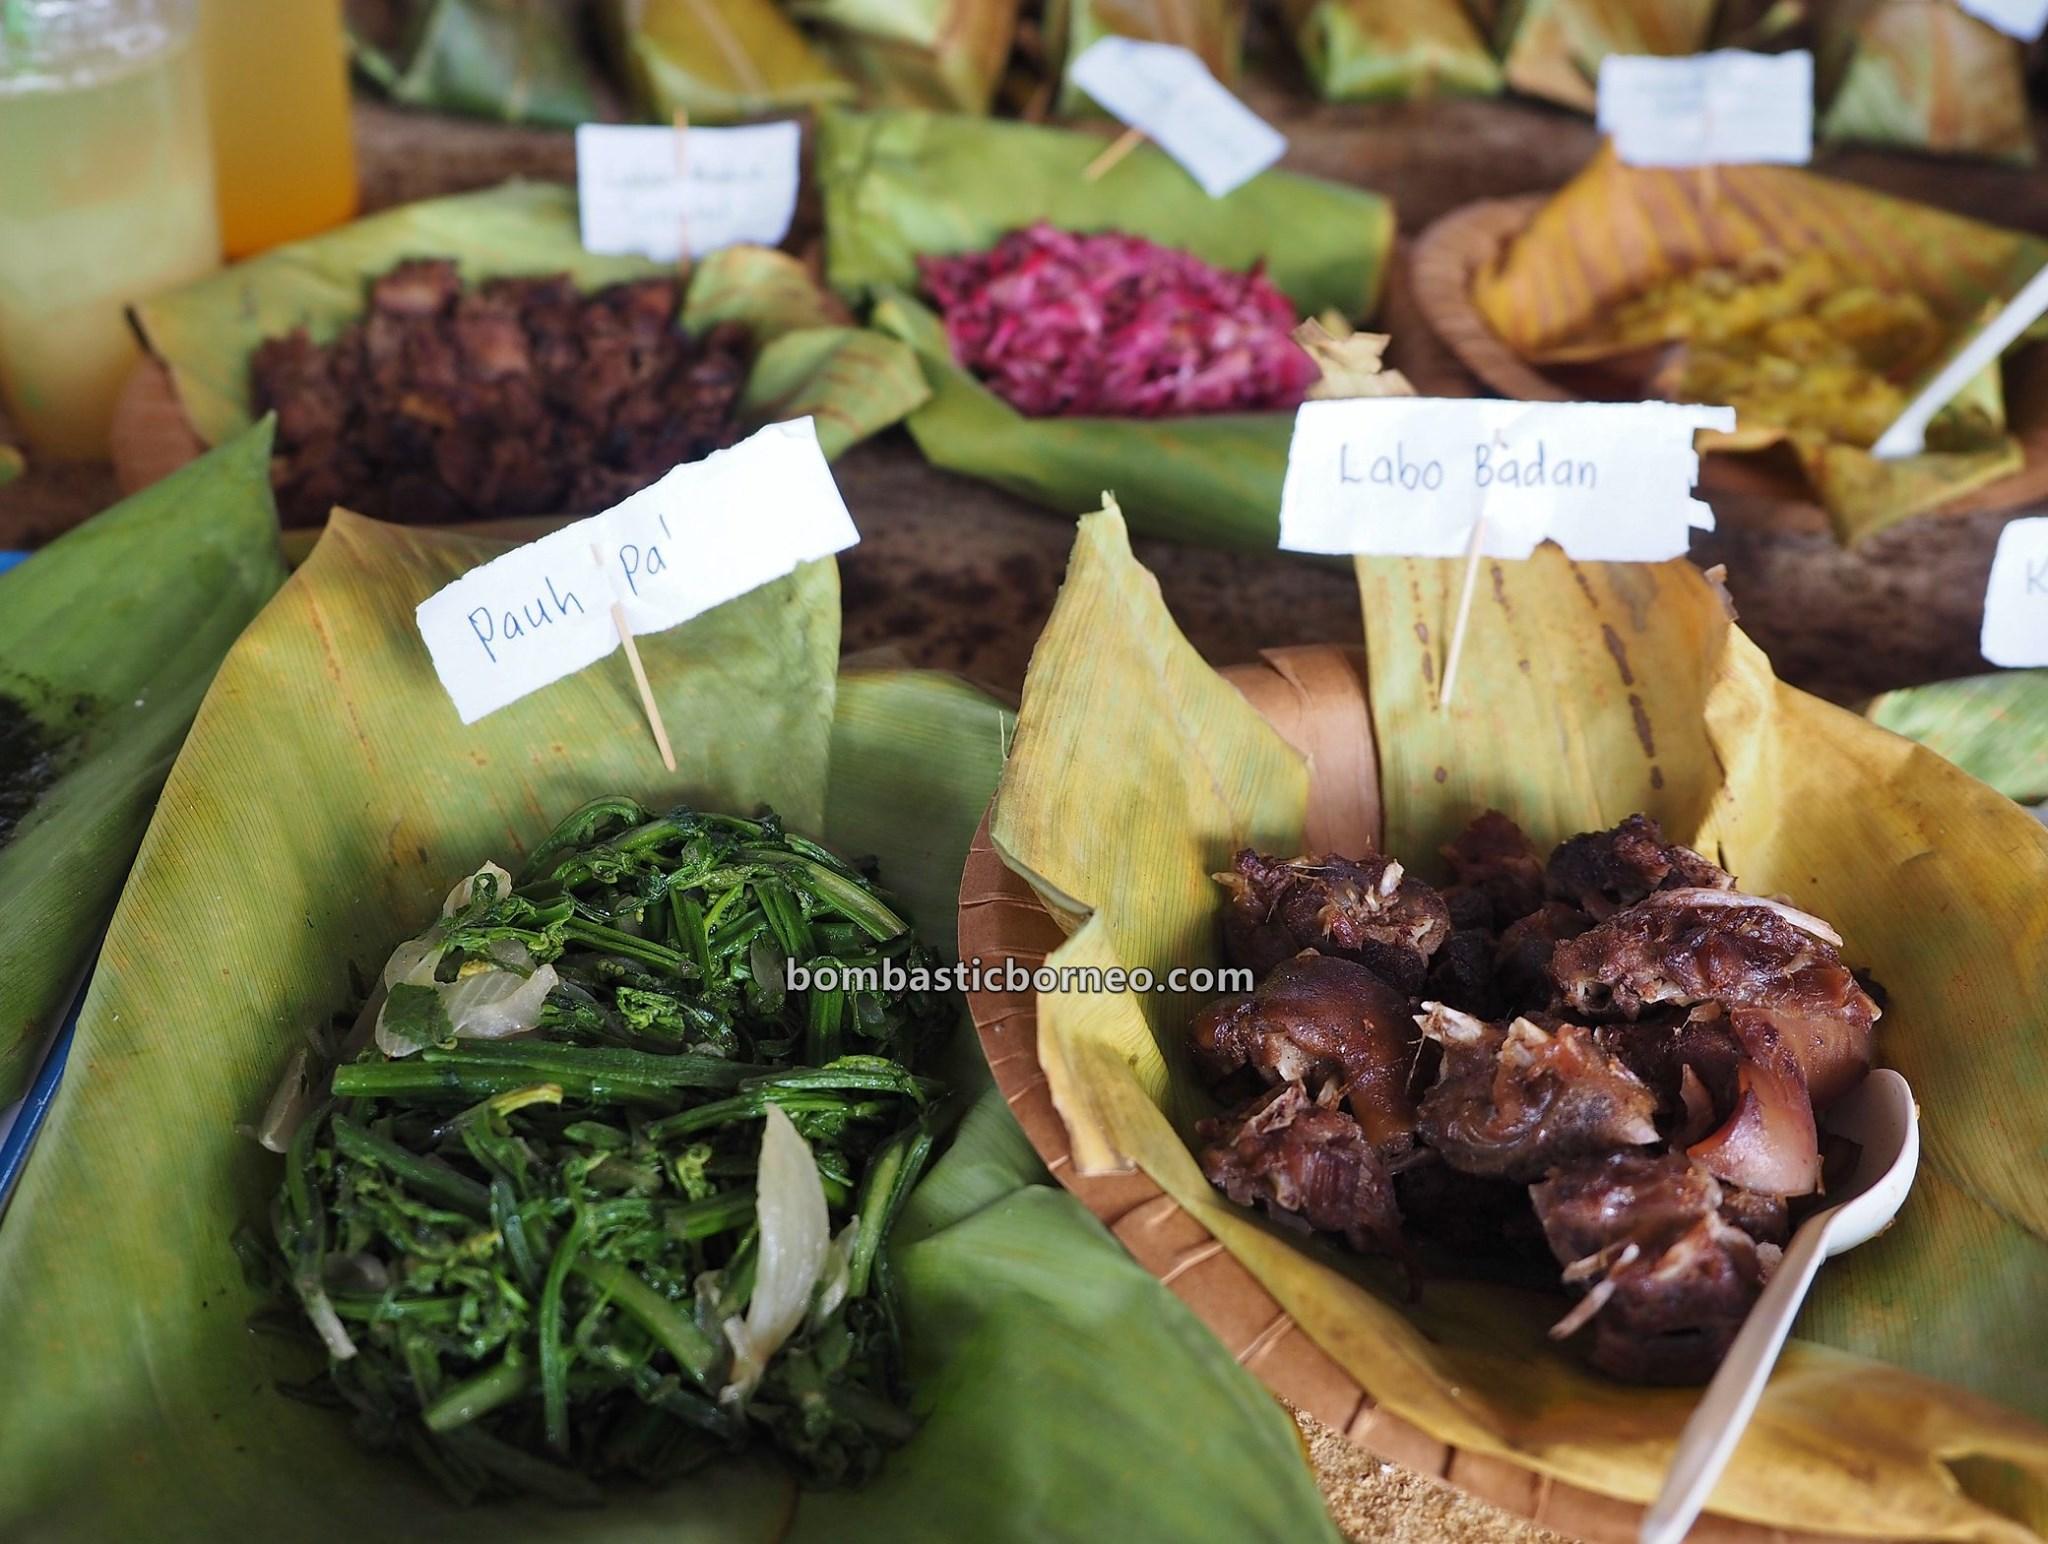 Pesta Nukenen, culture, culinary, authentic, traditional, dayak, native, Orang Ulu, Malaysia, Tourist attraction, travel guide, Borneo, 婆罗洲砂拉越达雅, 巴里奥乌鲁人美食, 原住民传统文化,